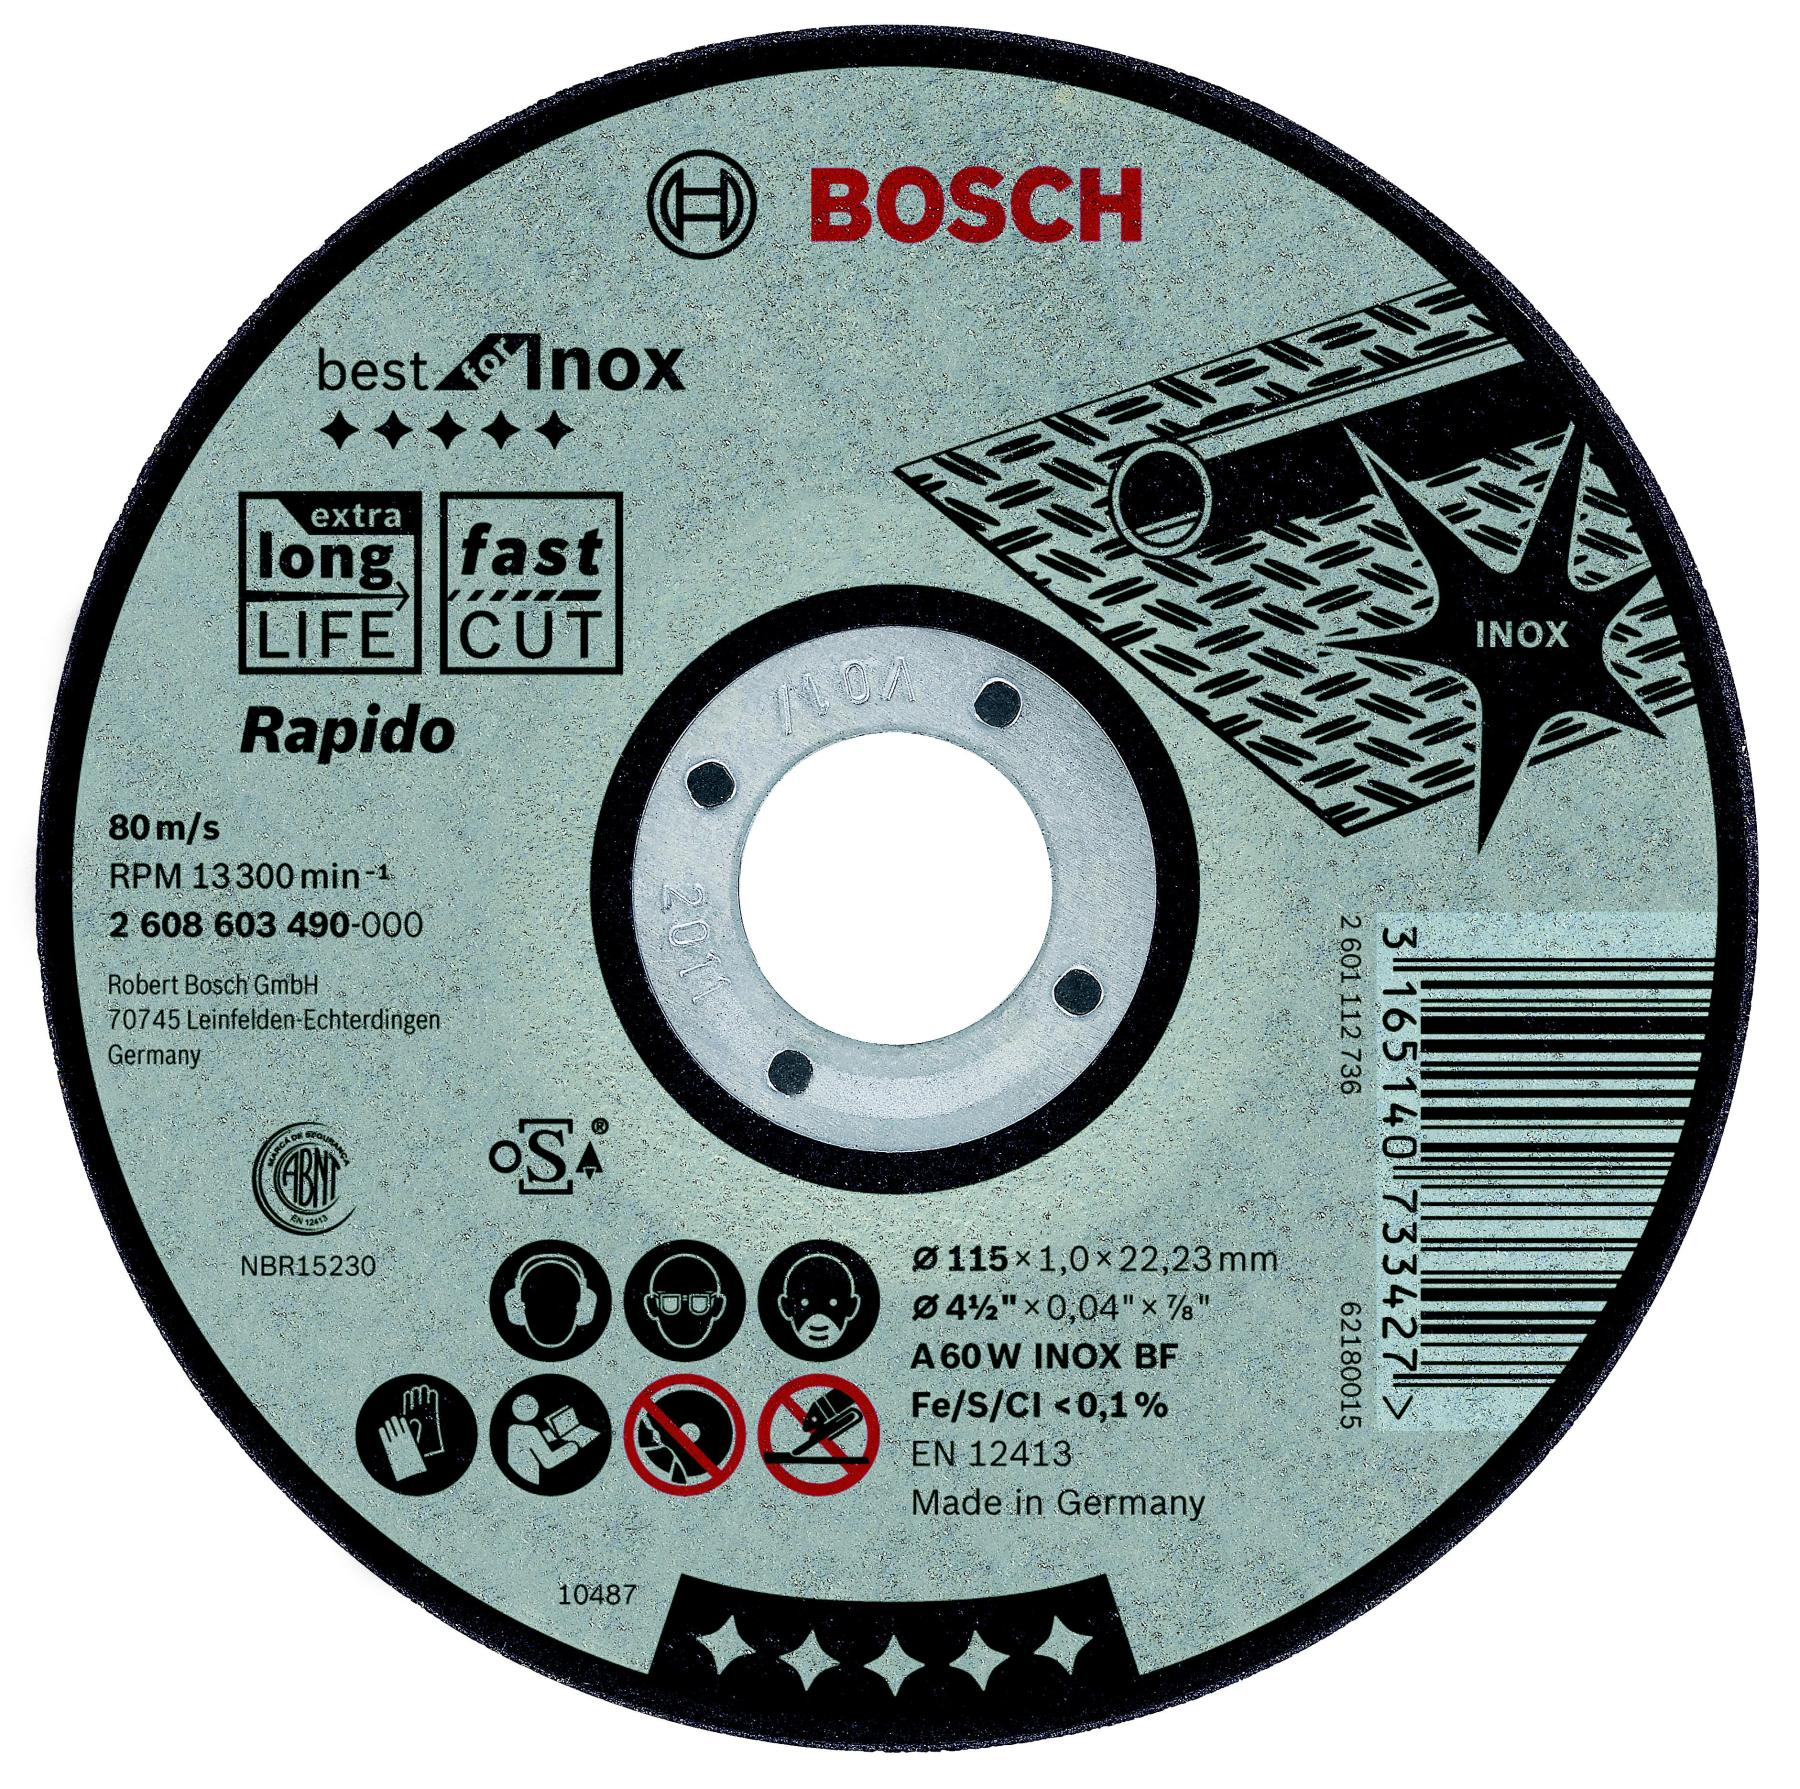 Circle Cutting BOSCH 180х1. 6x22 Best For Inox (2.608.603.498)